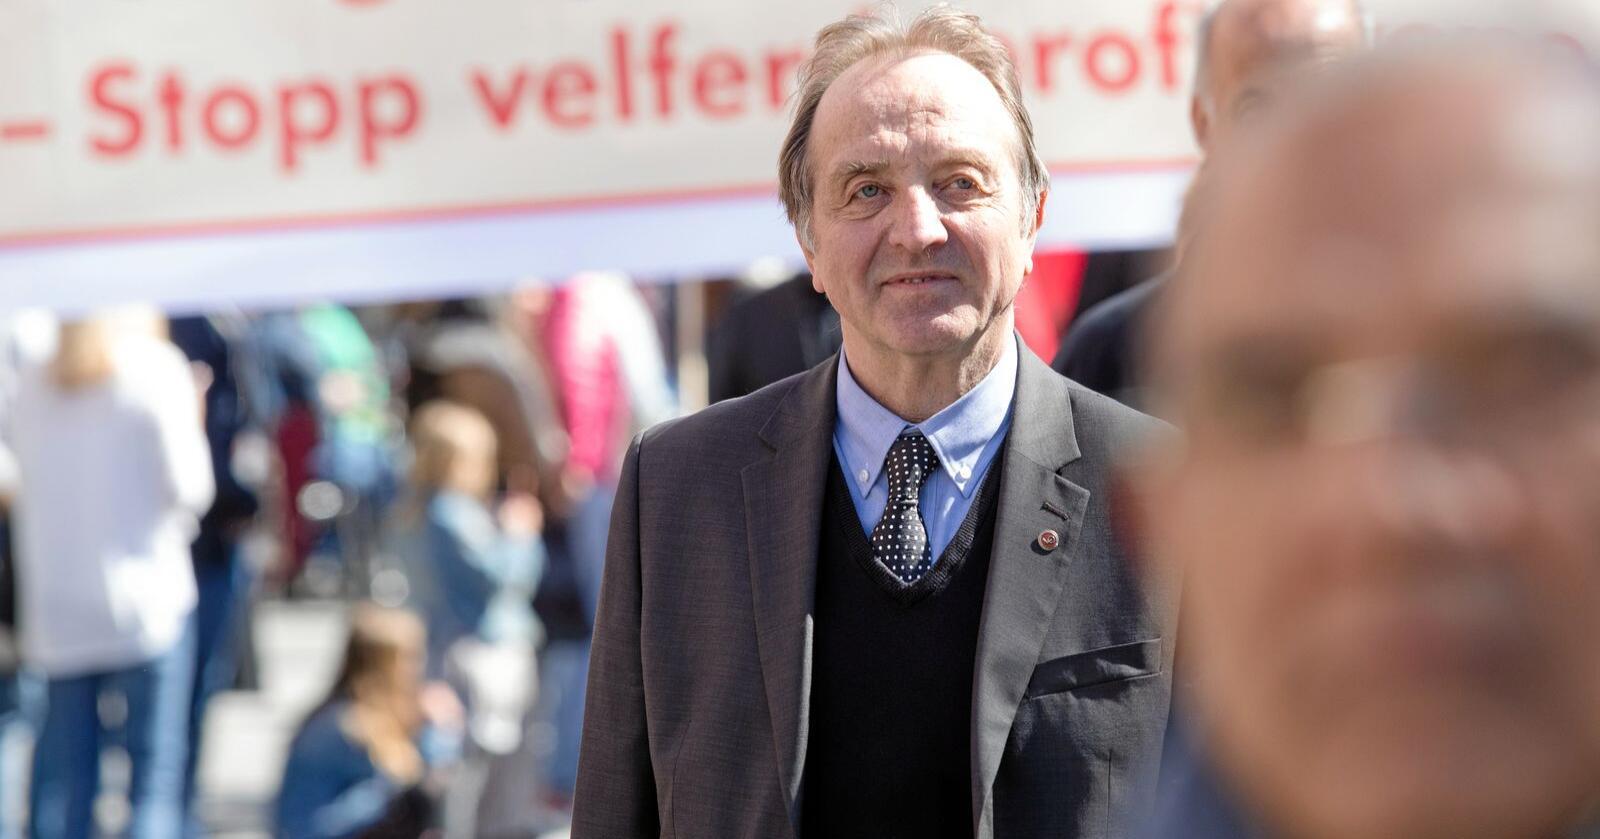 Roy Pedersen, leiar for Nei til EU. Foto: Audun Braastad / NTB